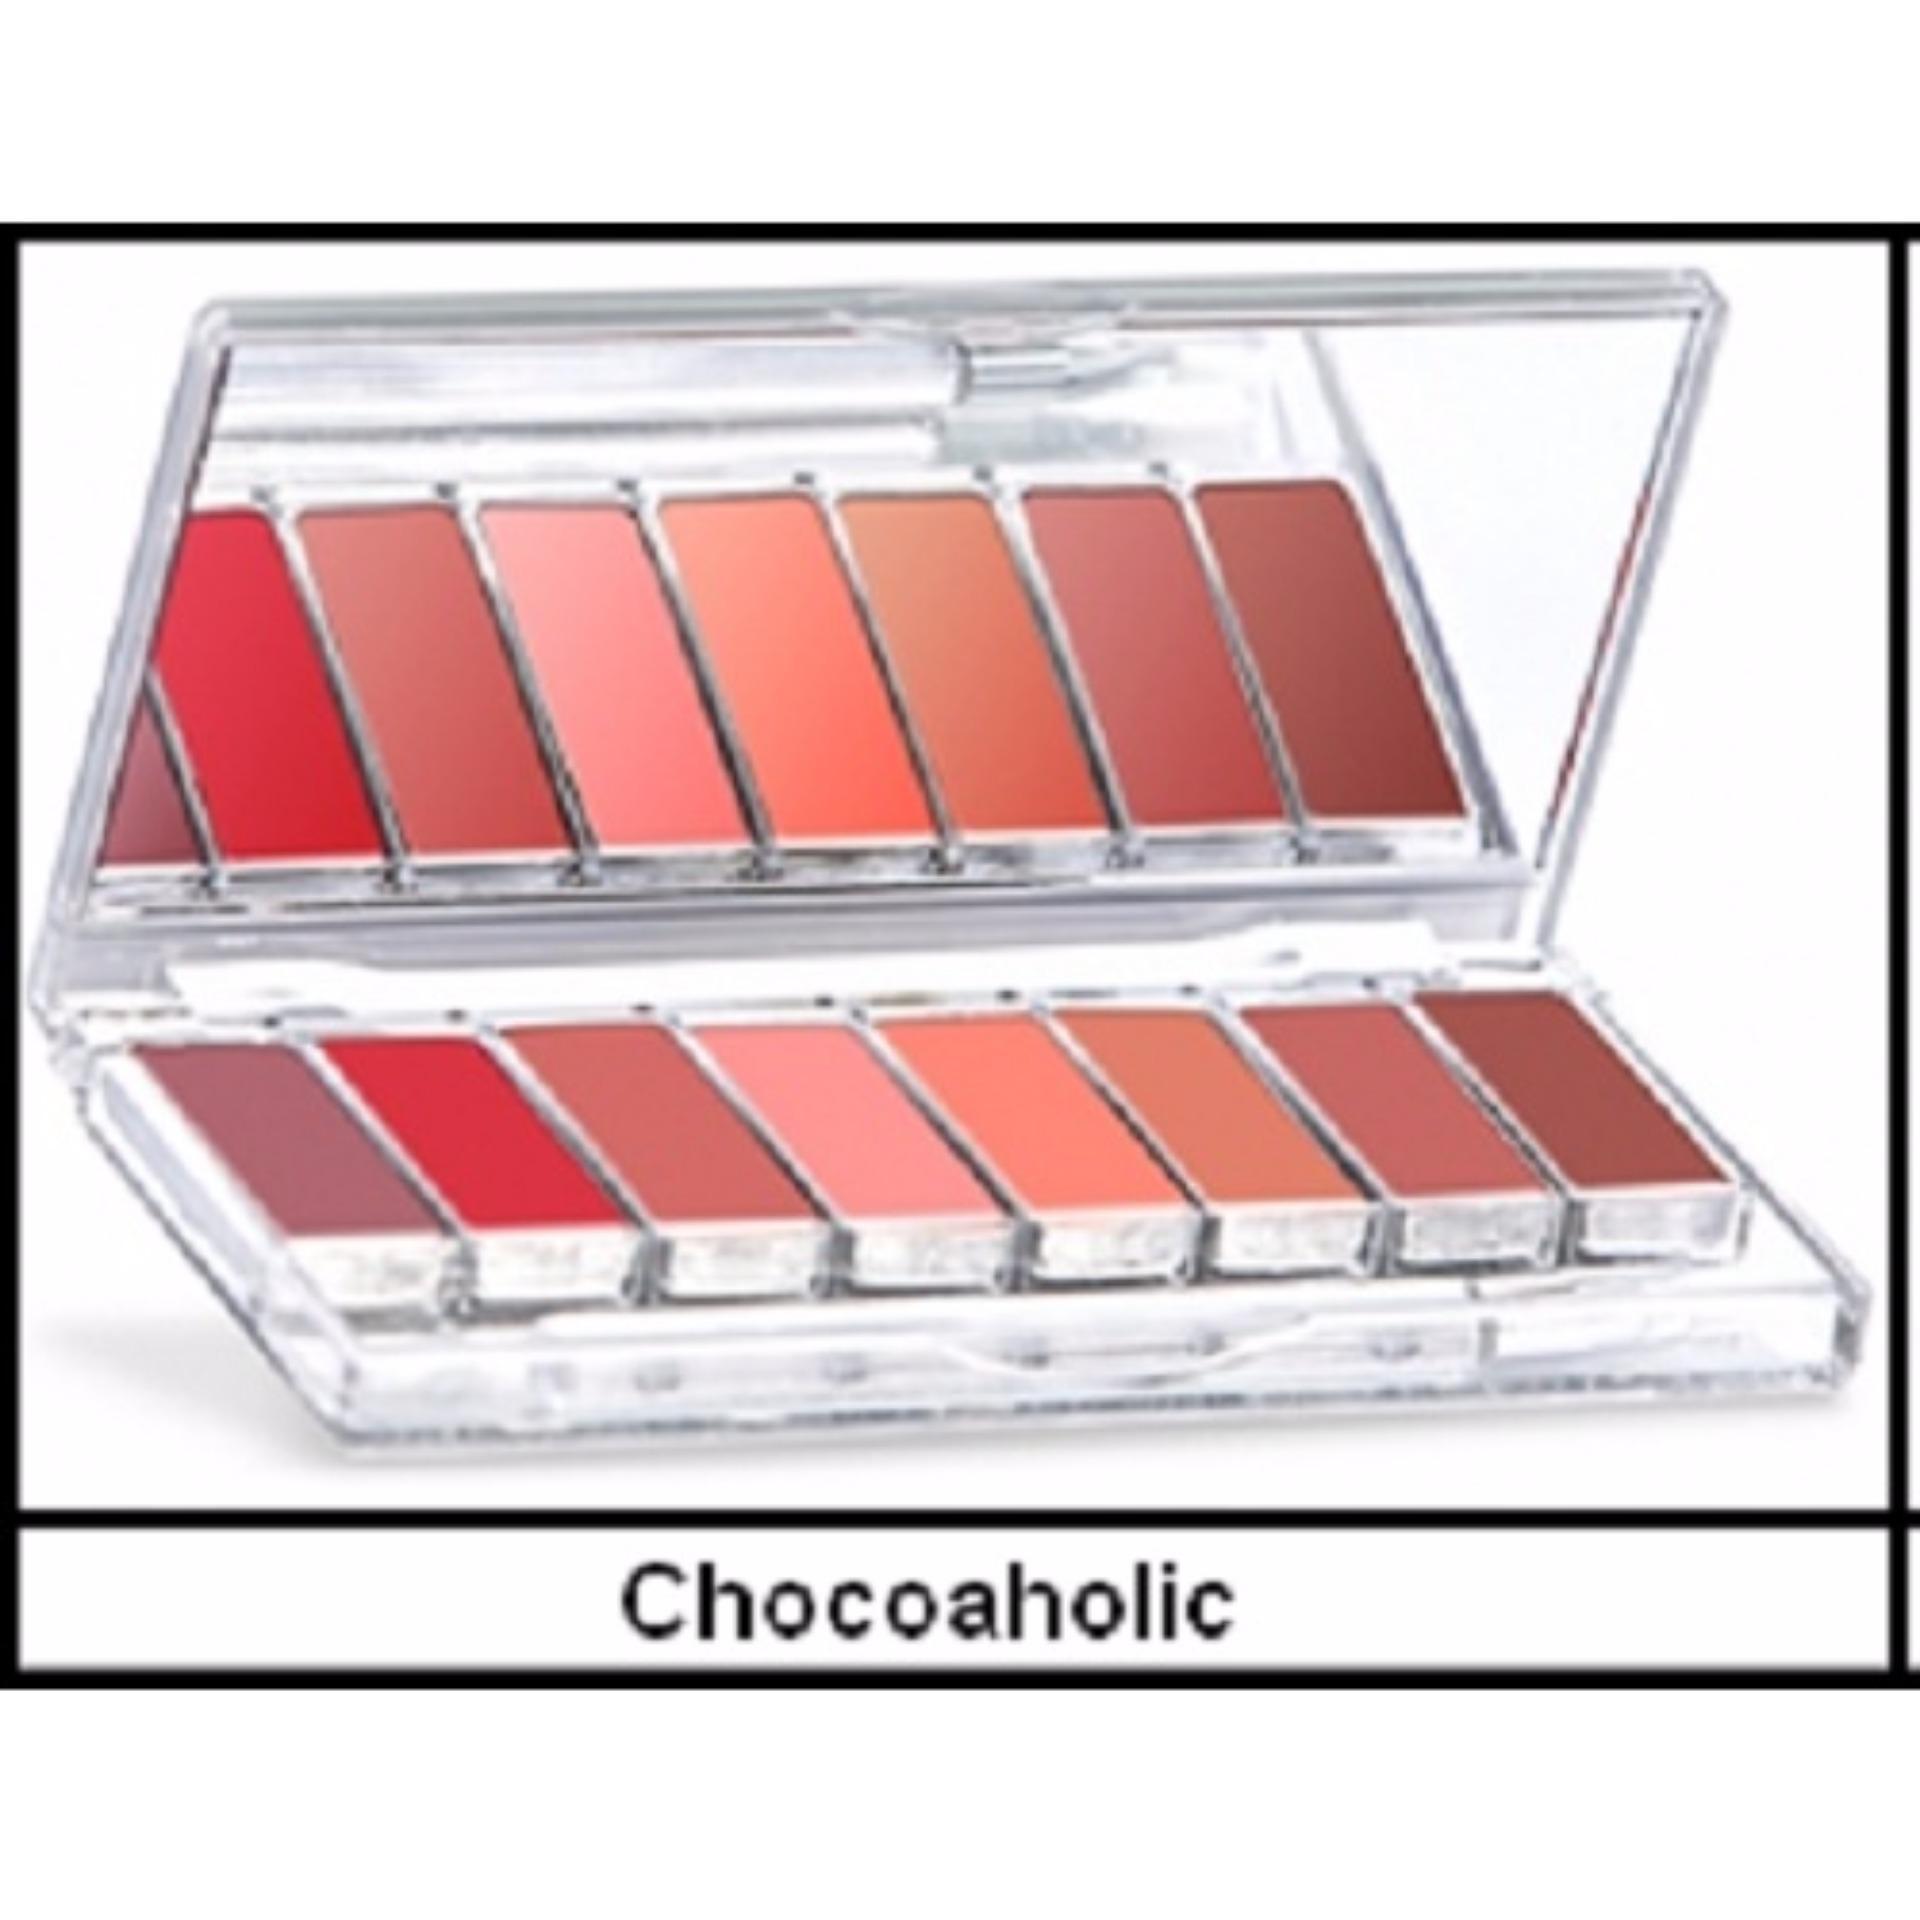 Wardah Lipstik Palette - Chocoaholic